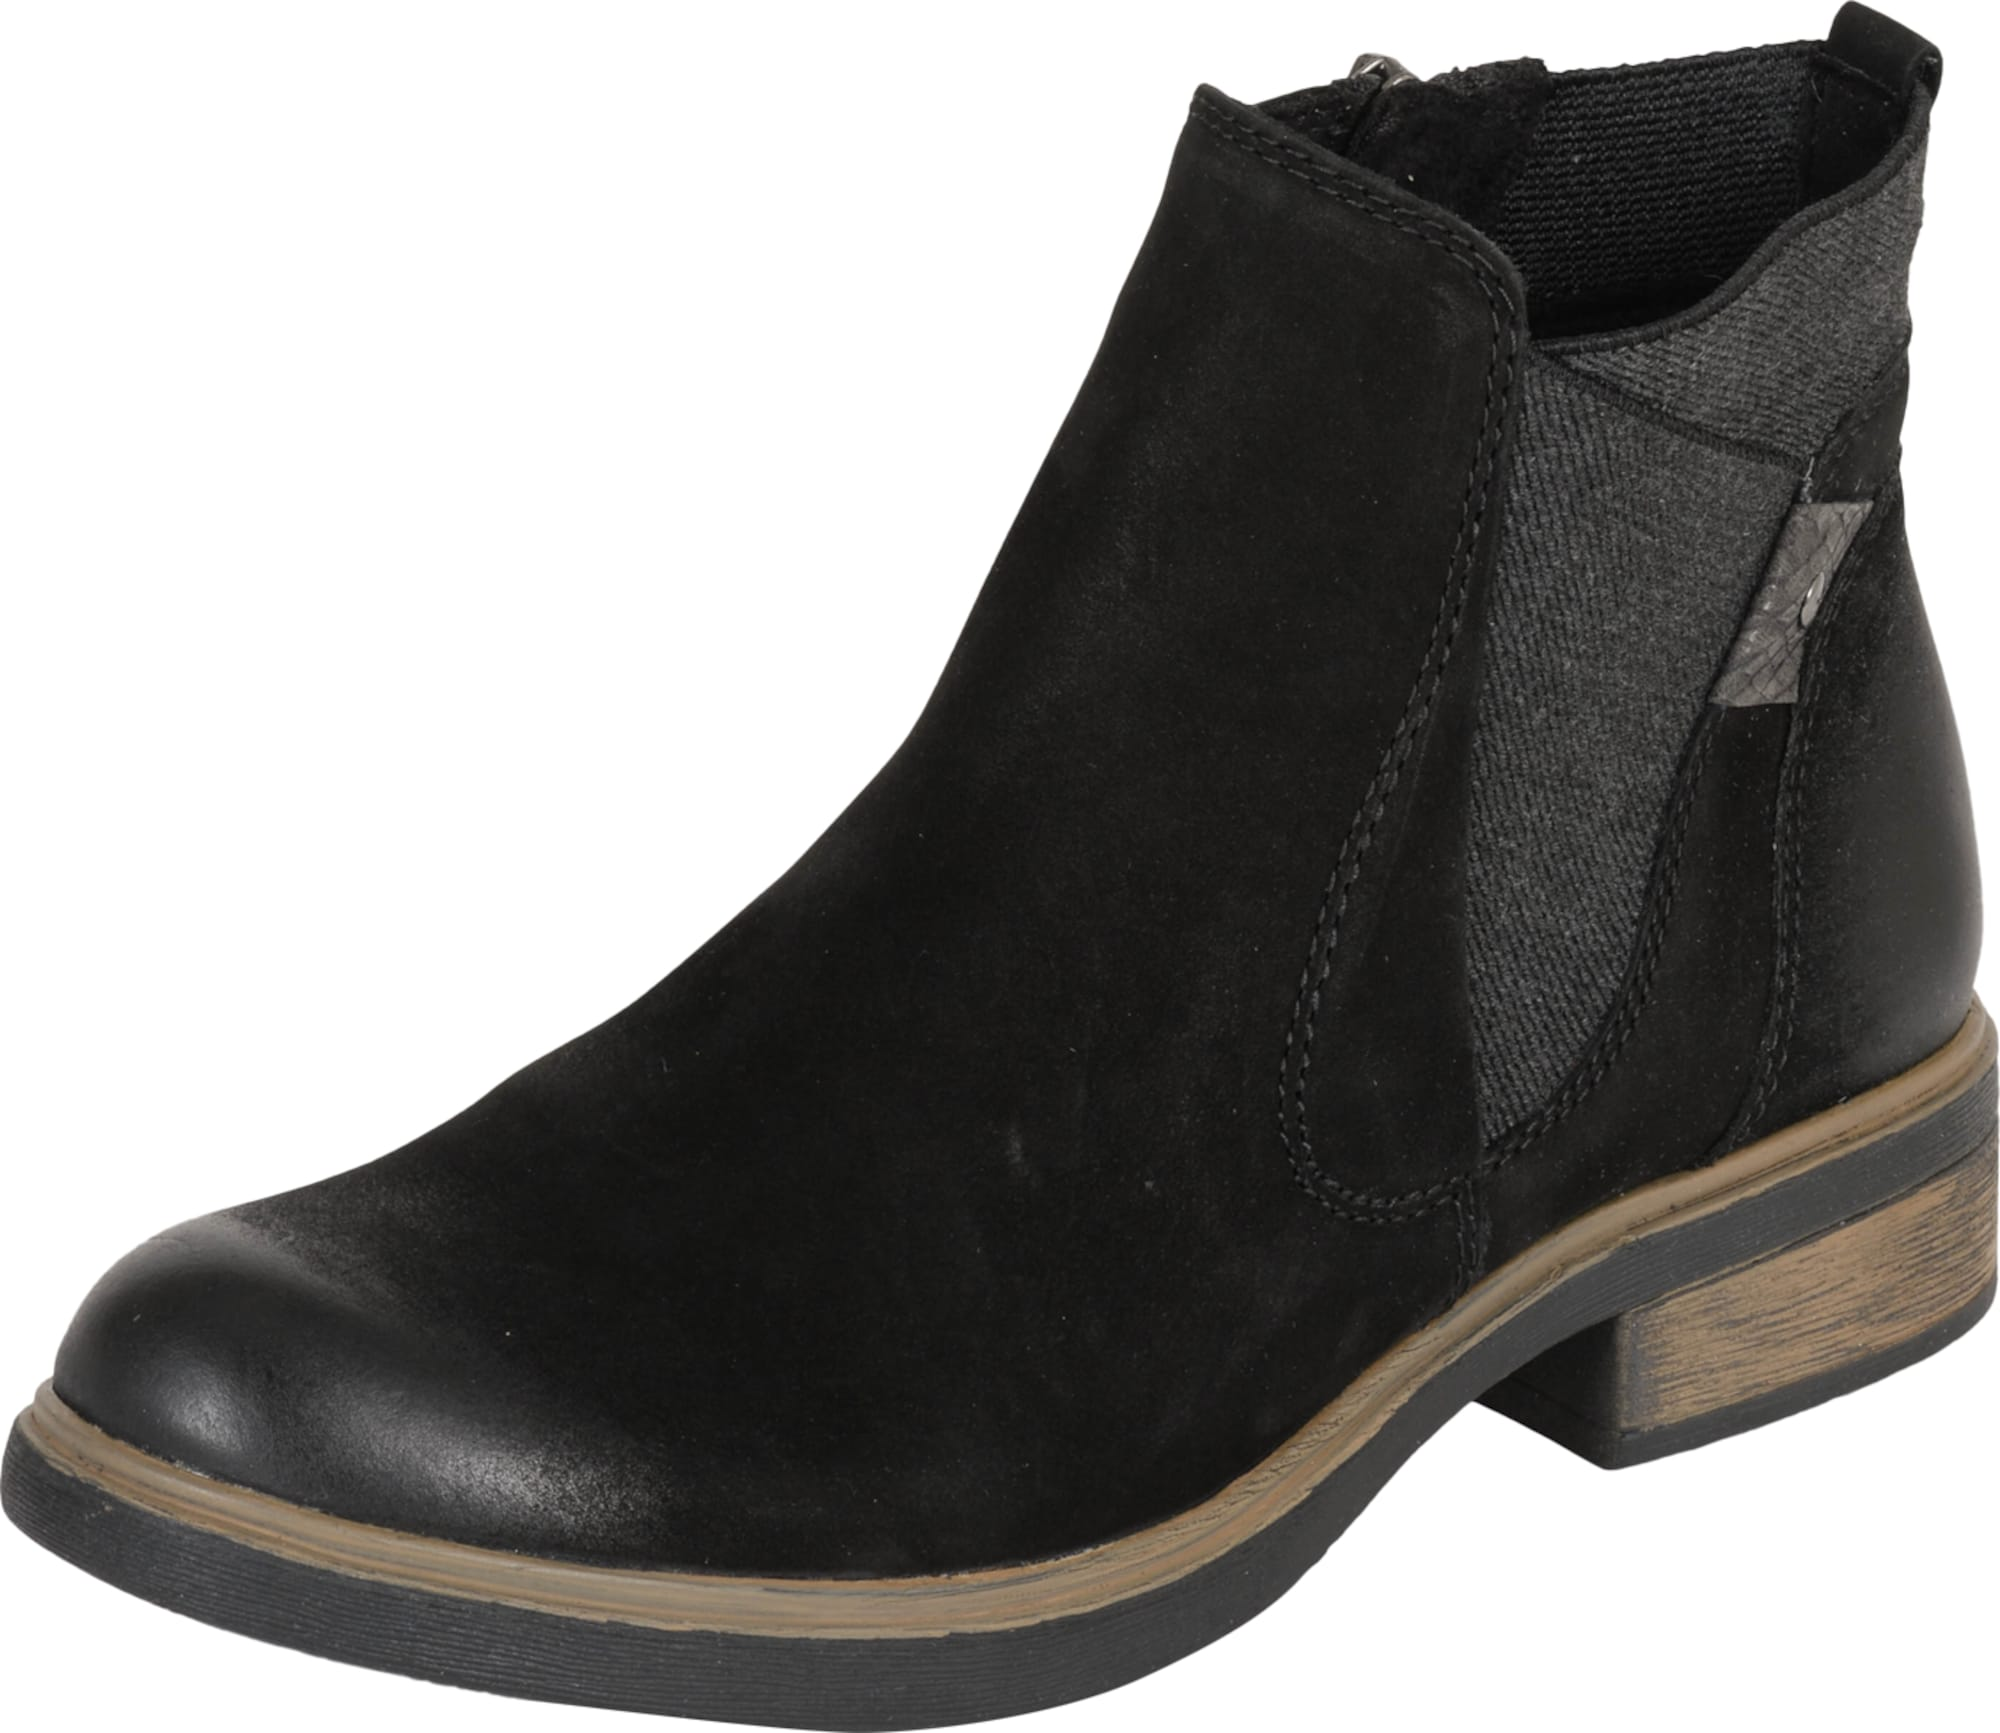 tamaris chelsea boots in schwarz. Black Bedroom Furniture Sets. Home Design Ideas